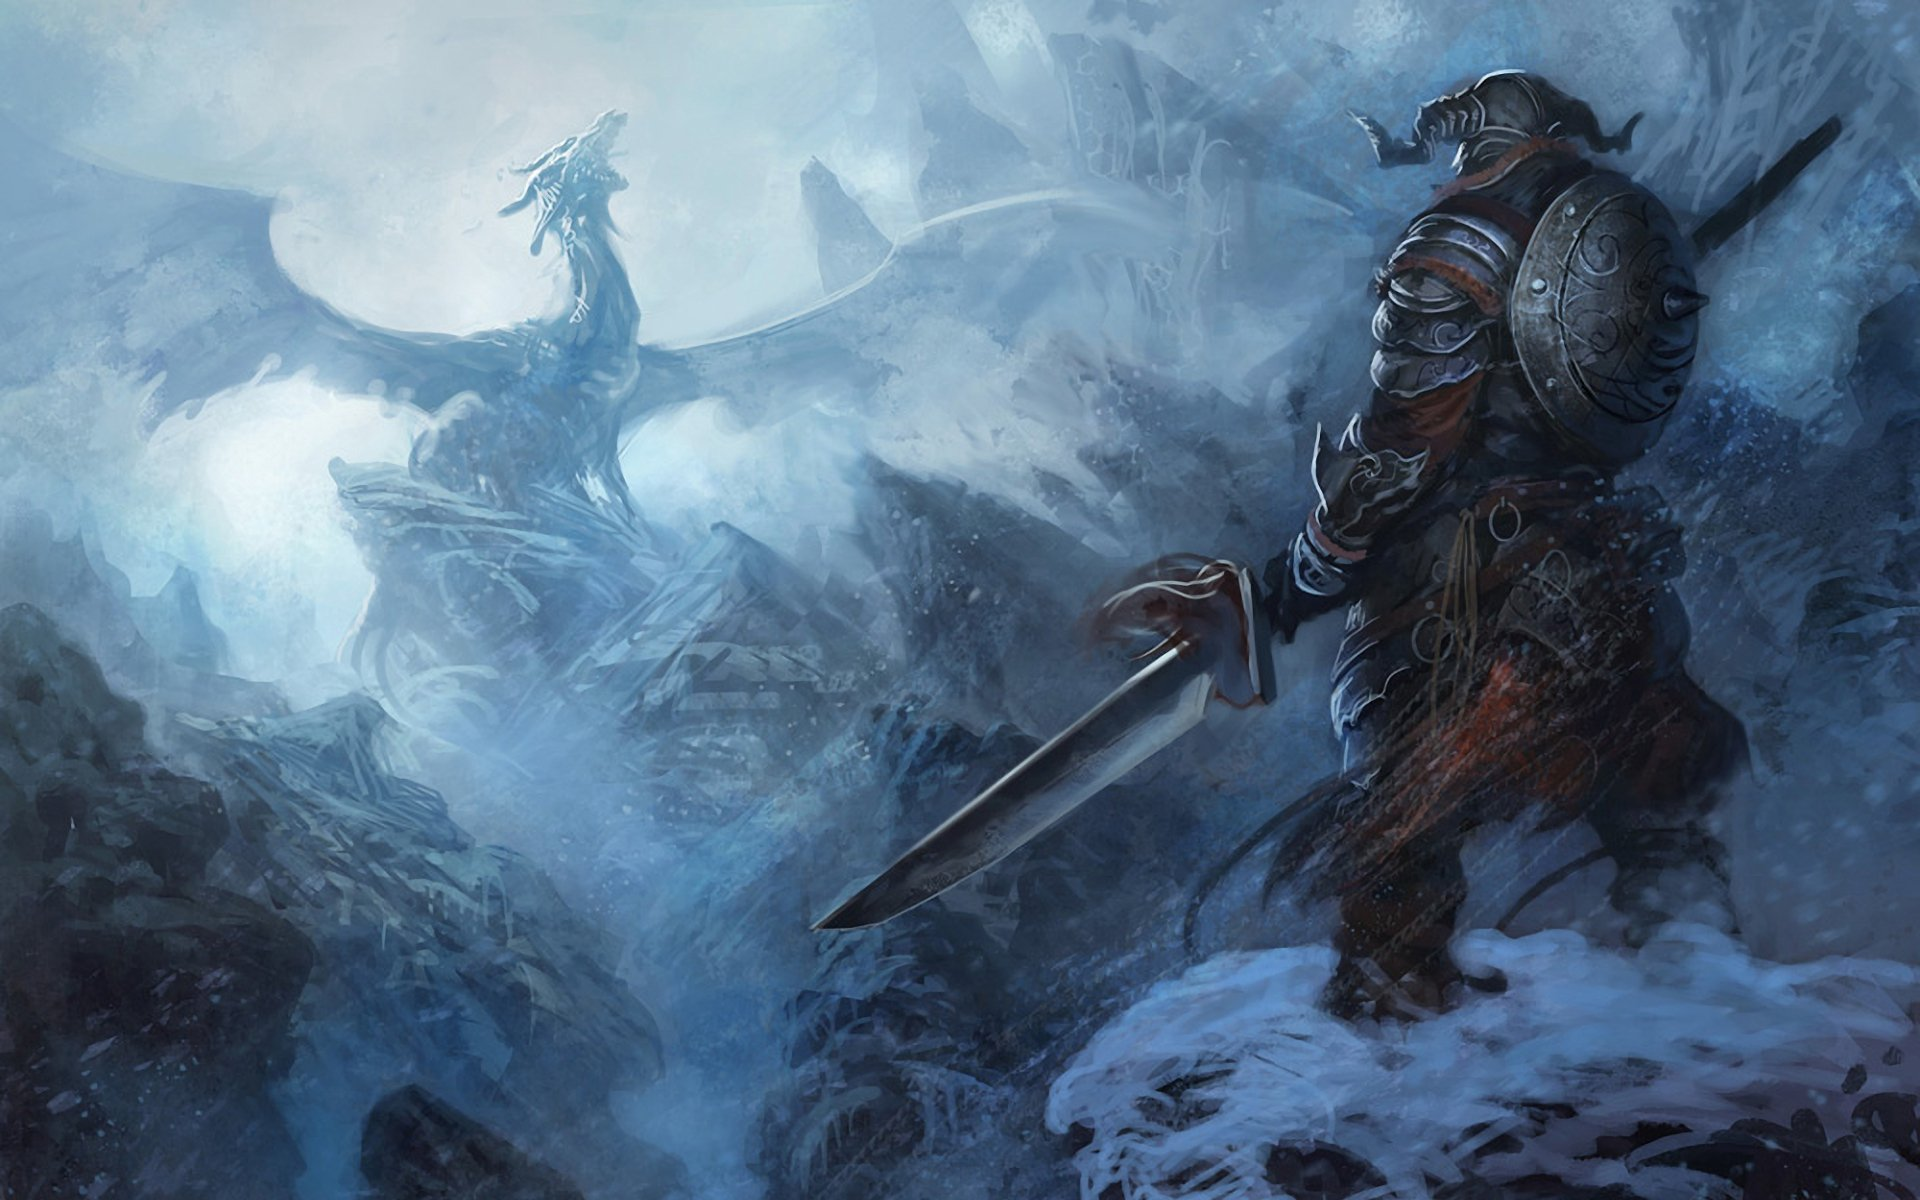 EvdWL over PlayStation vs Game Pass, Elder Scrolls Online, and Battlefield